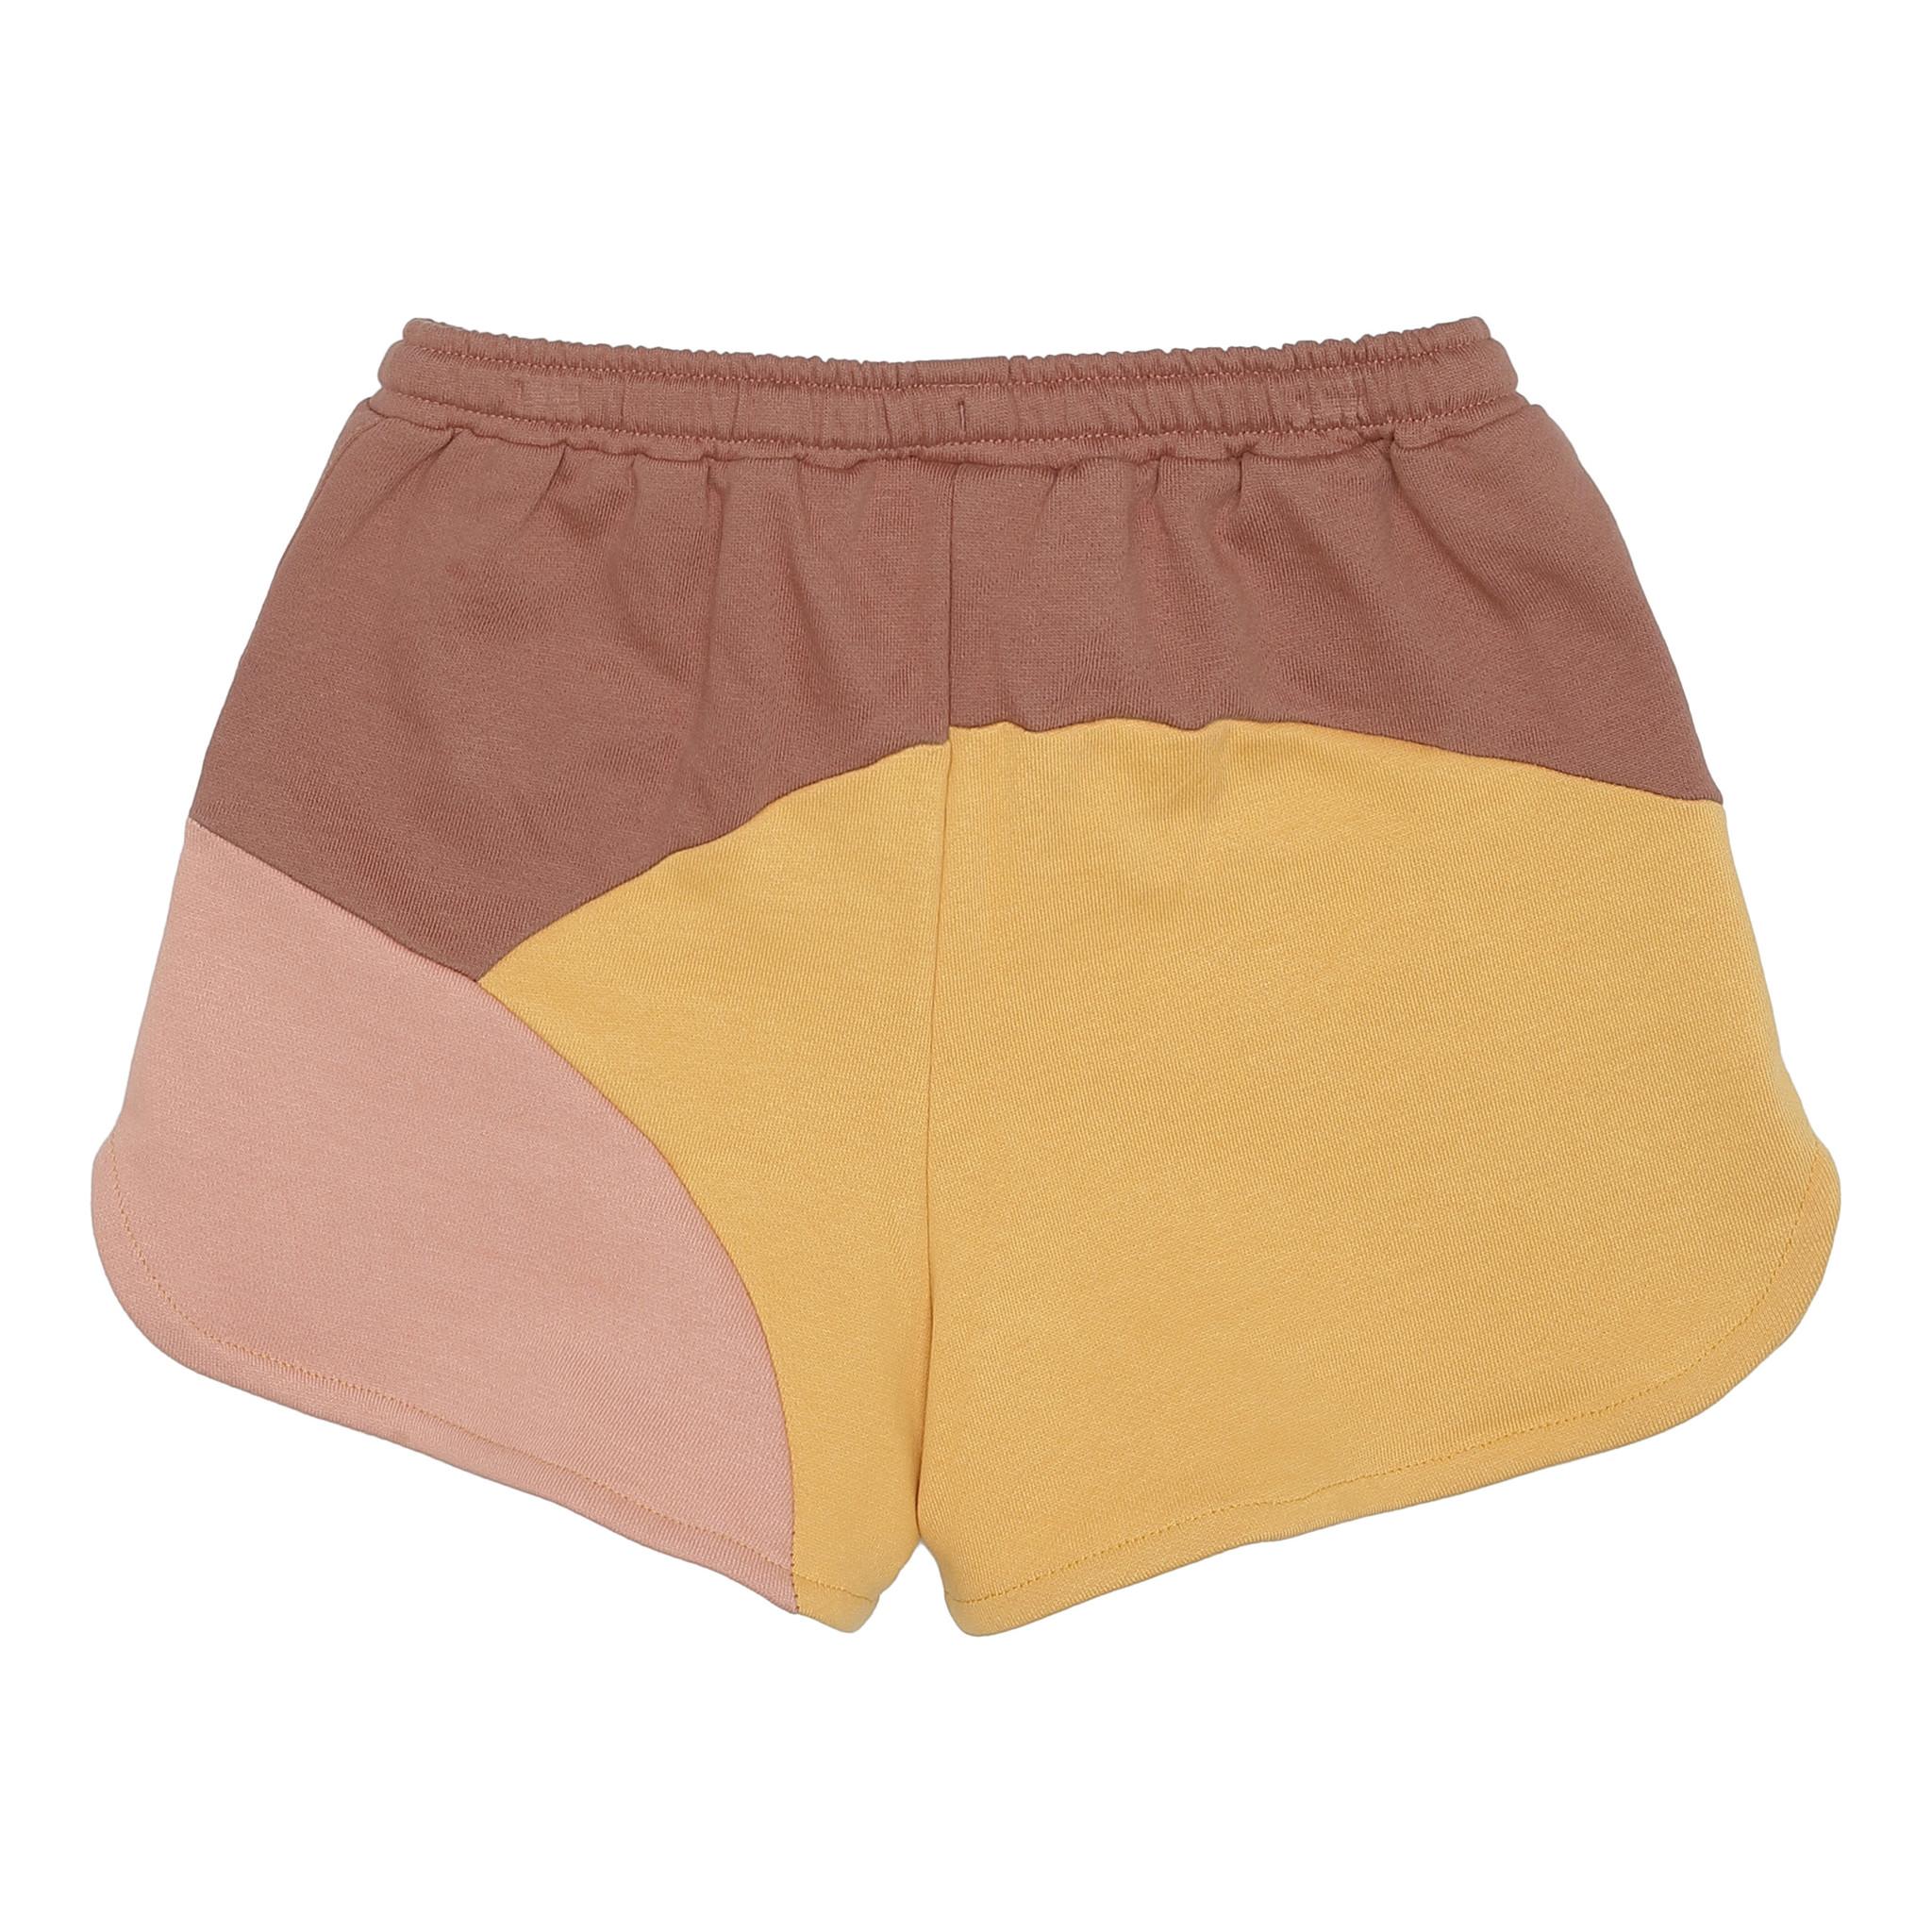 Paris shorts - Scenery Girl-3